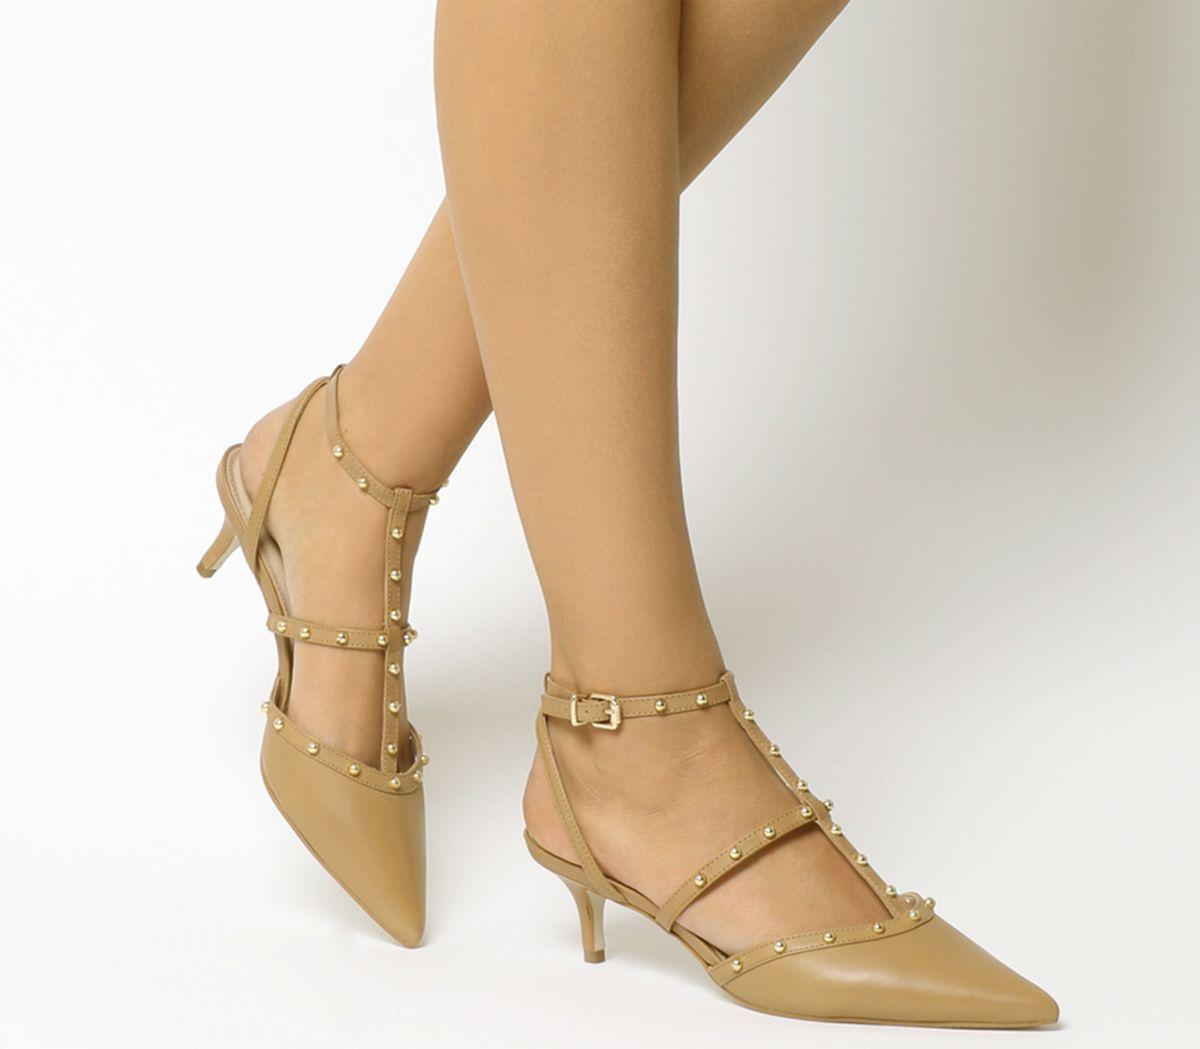 2b7b0805186 Office Manner Studded Point Kitten Heels Nude Leather - Mid Heels